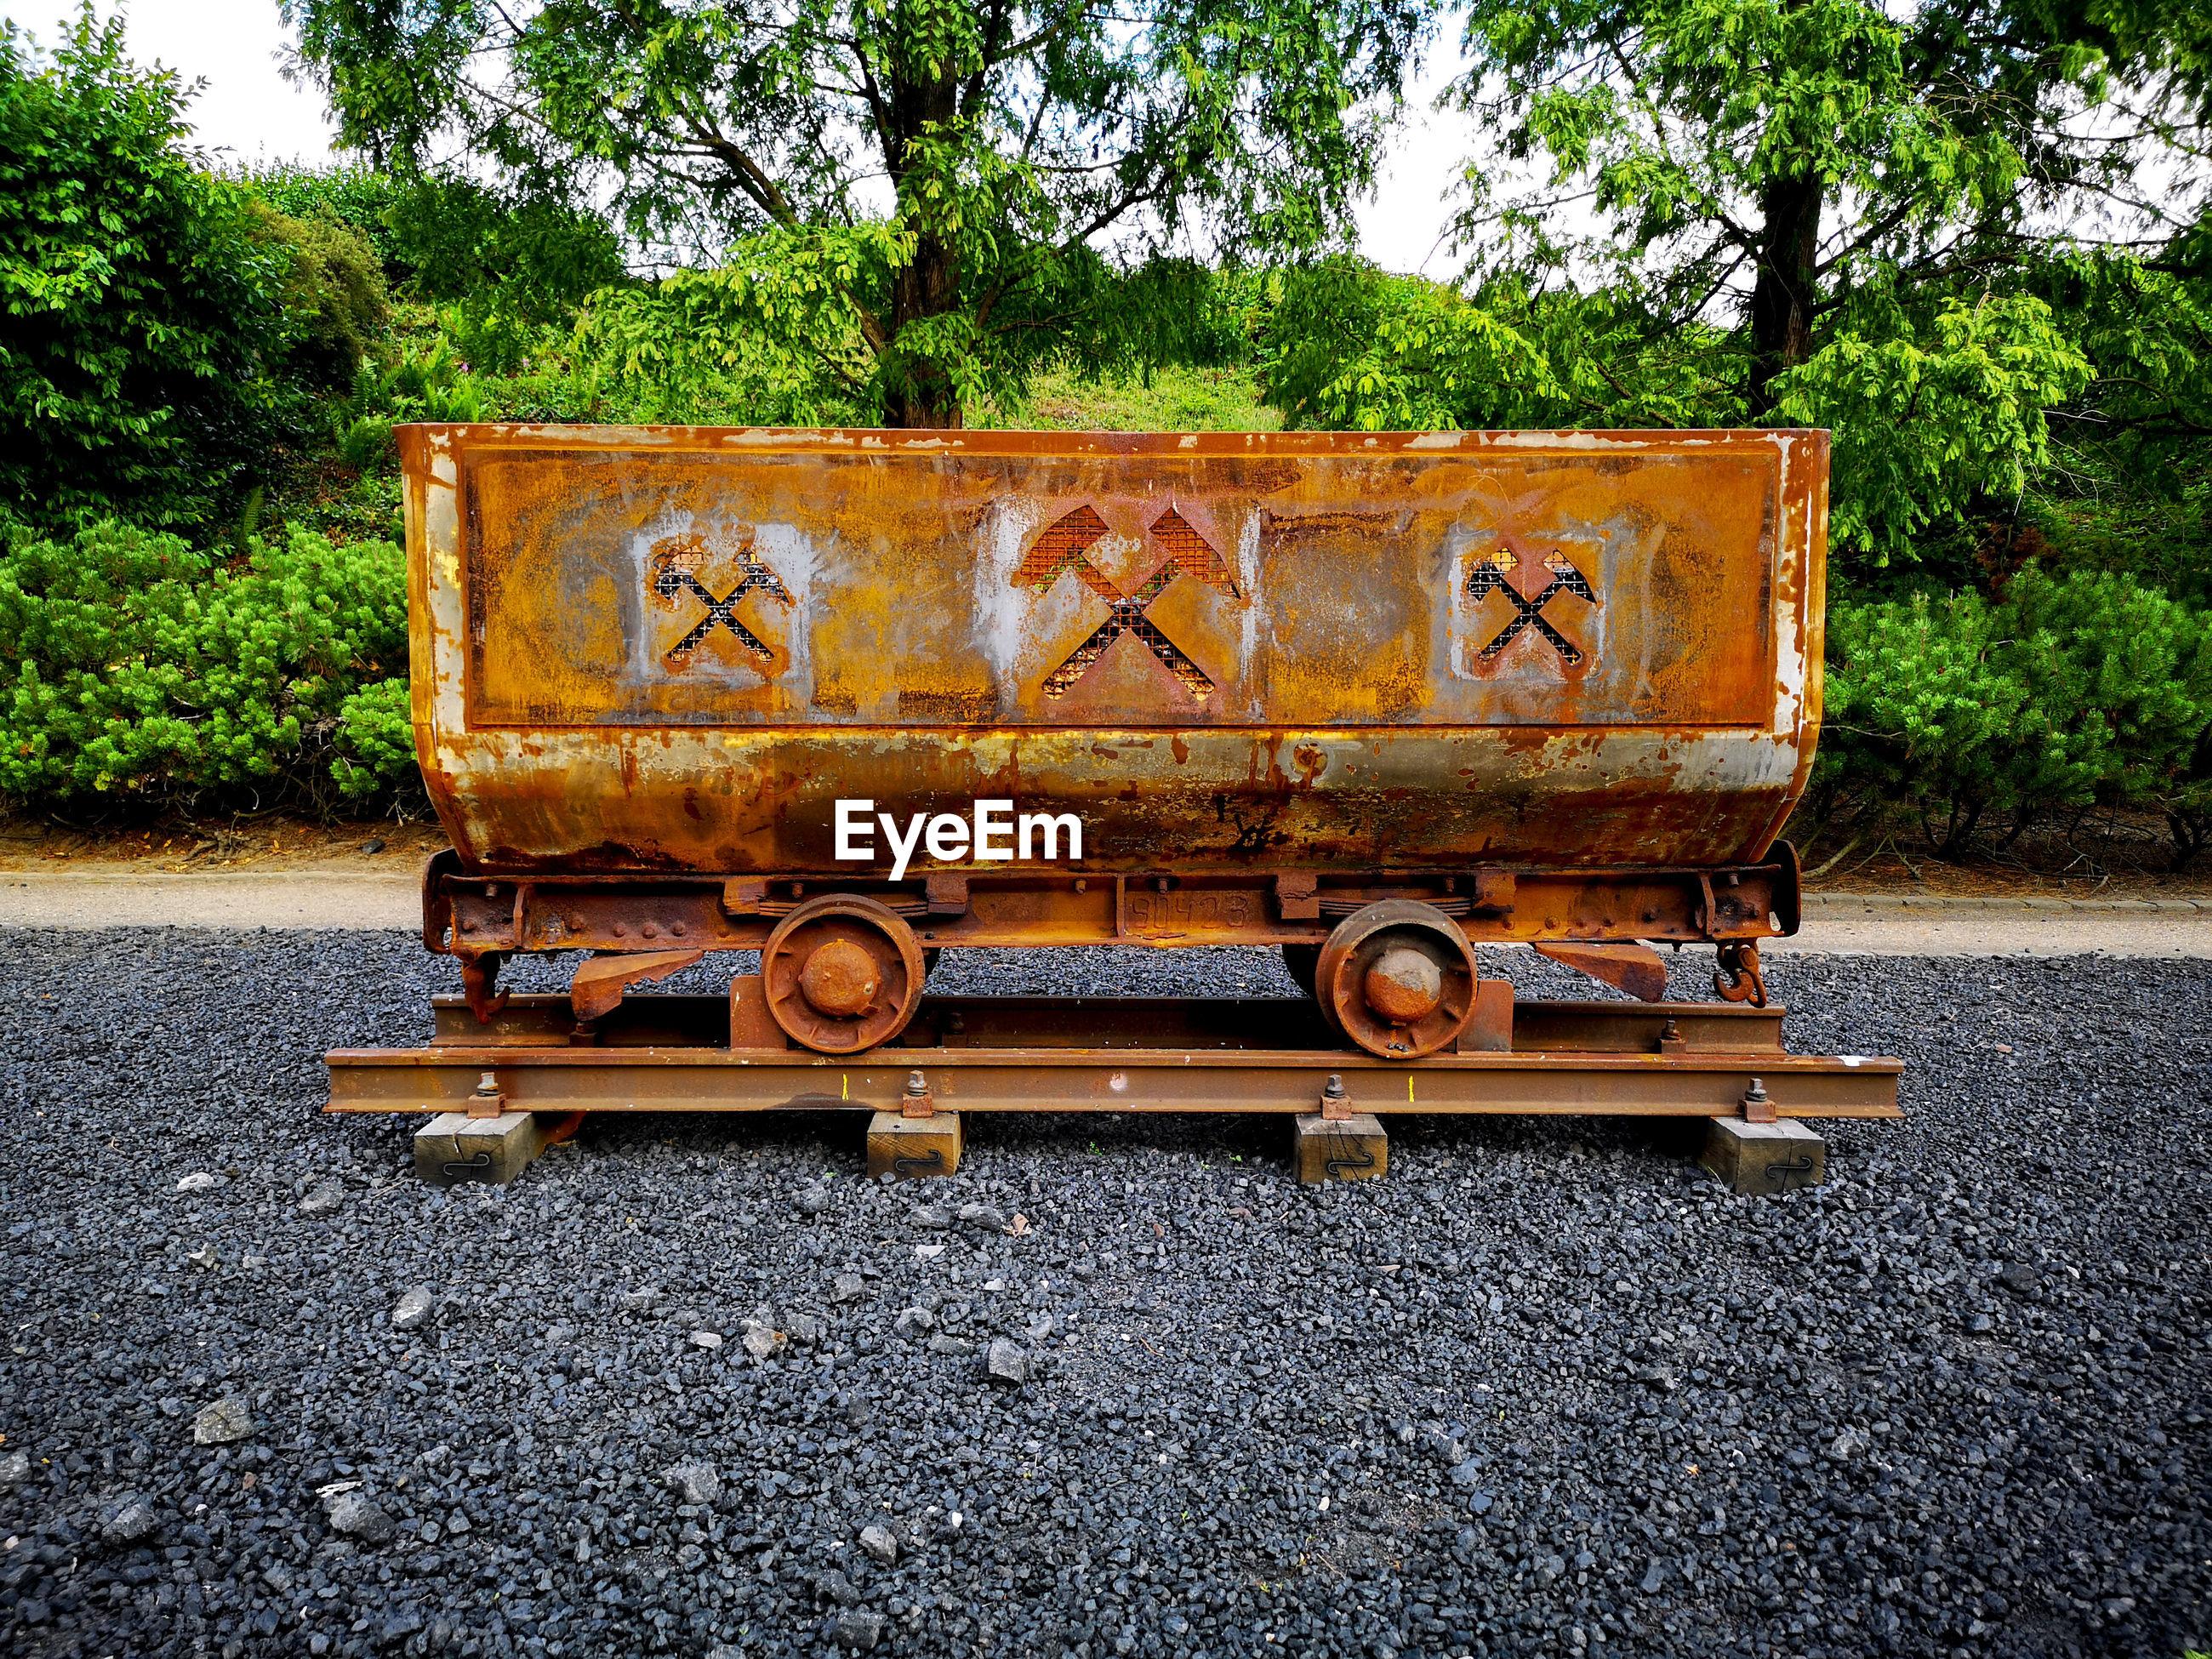 Abandoned train on railroad track against trees